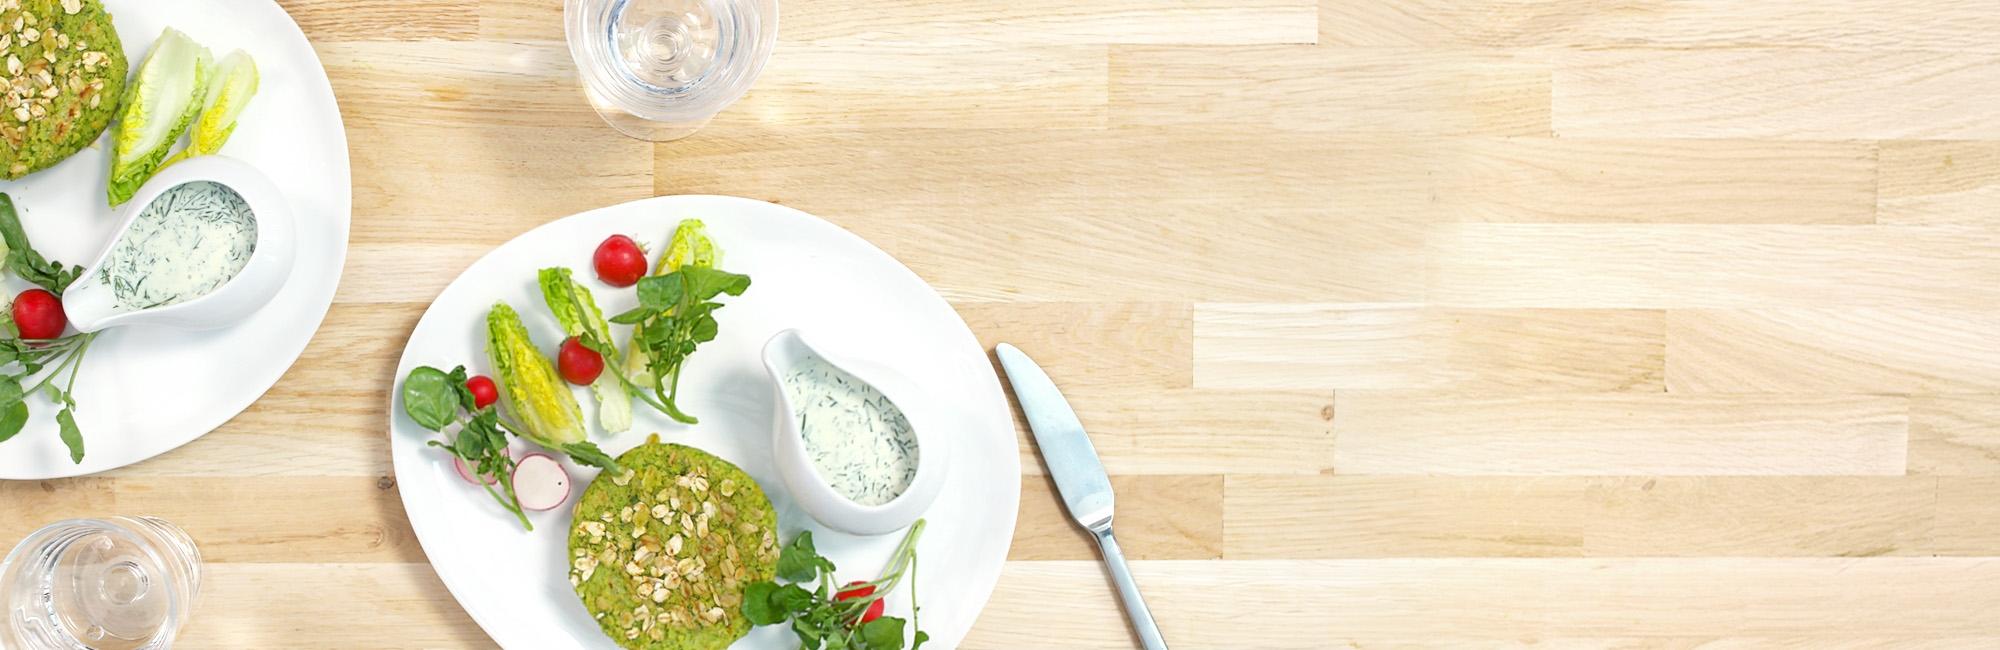 groenteburger, kikkererwten, dille-roomsaus, rauwkostsalade